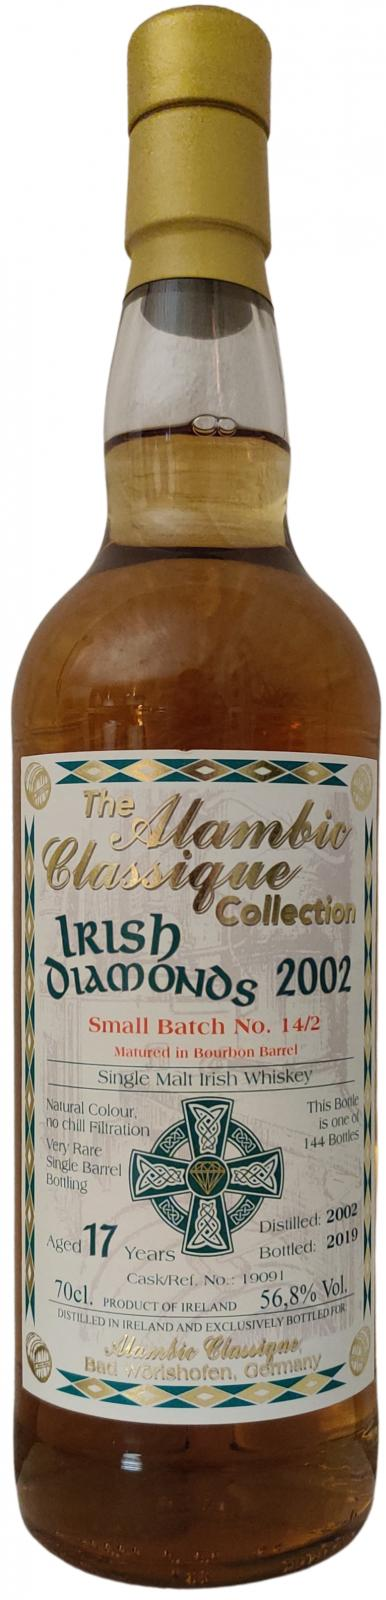 Irish Diamonds 2002 AC